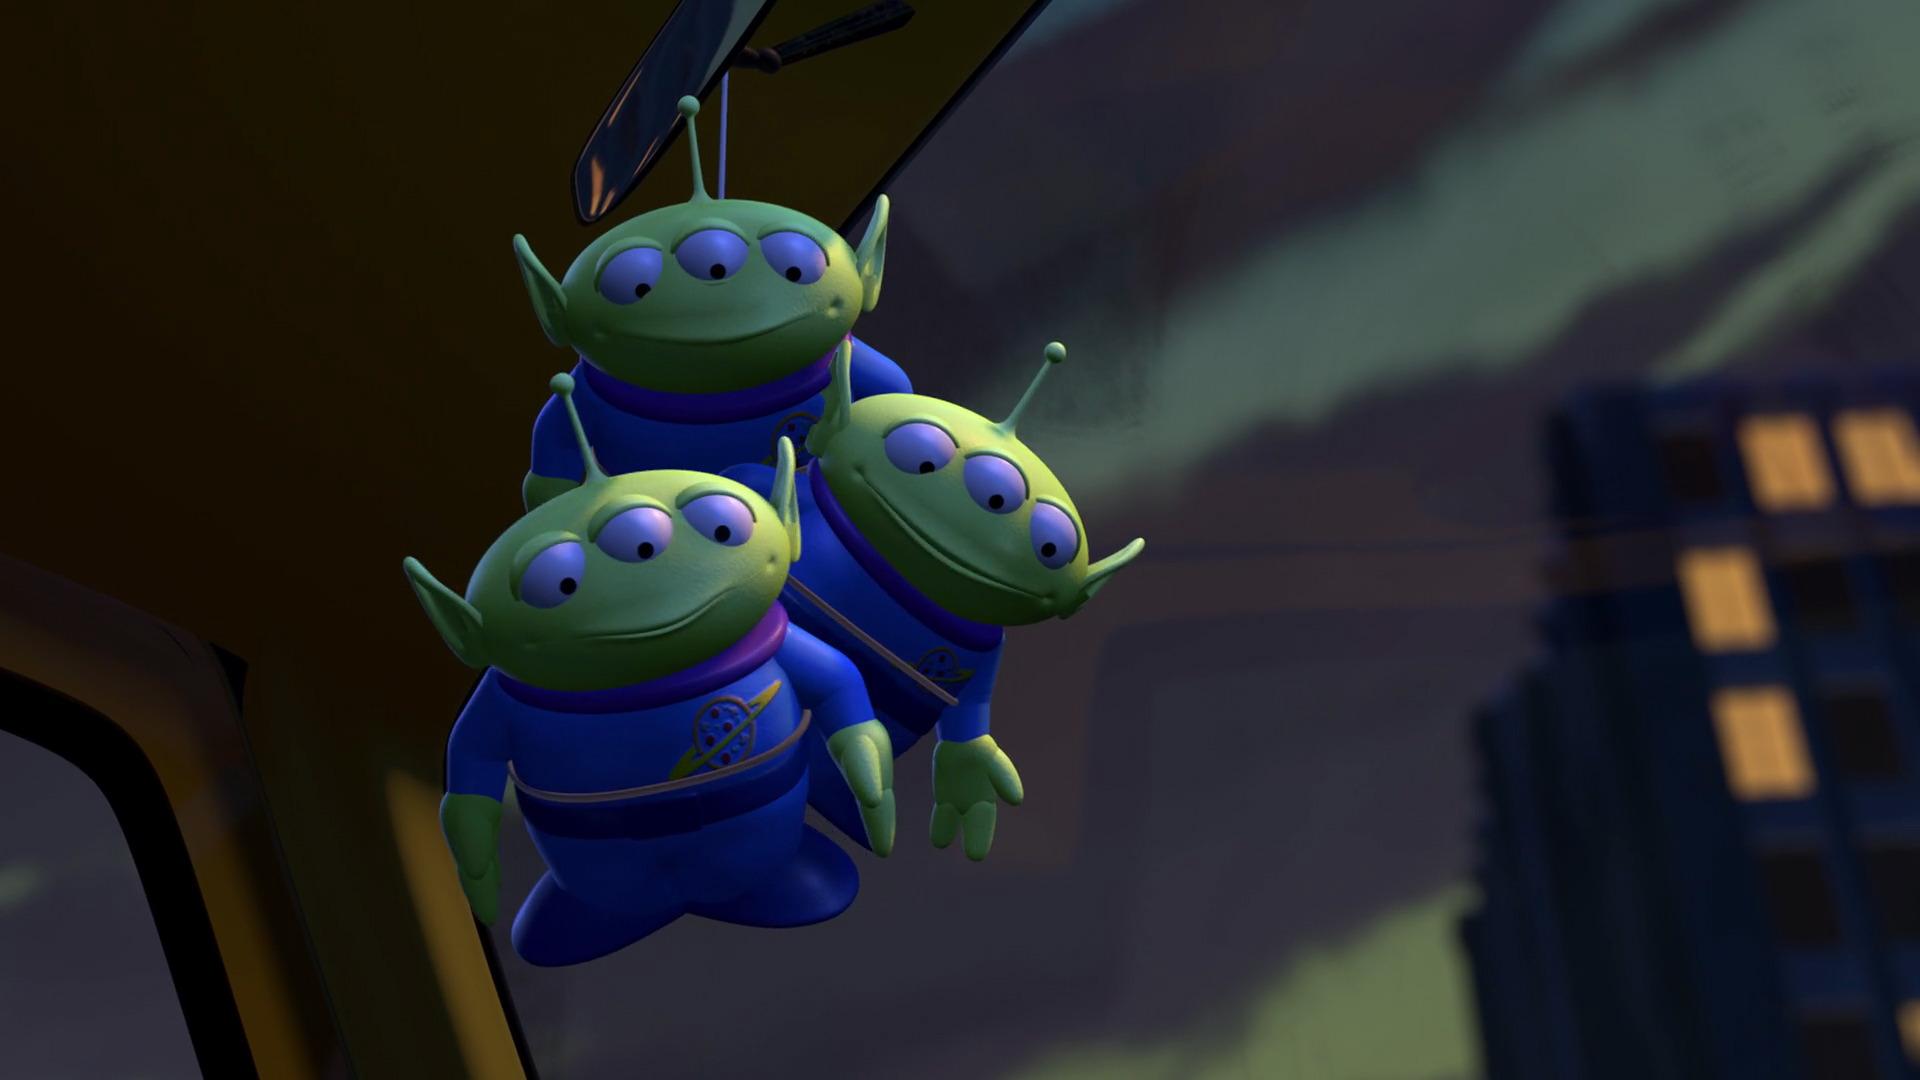 Bonhomme Toy Story